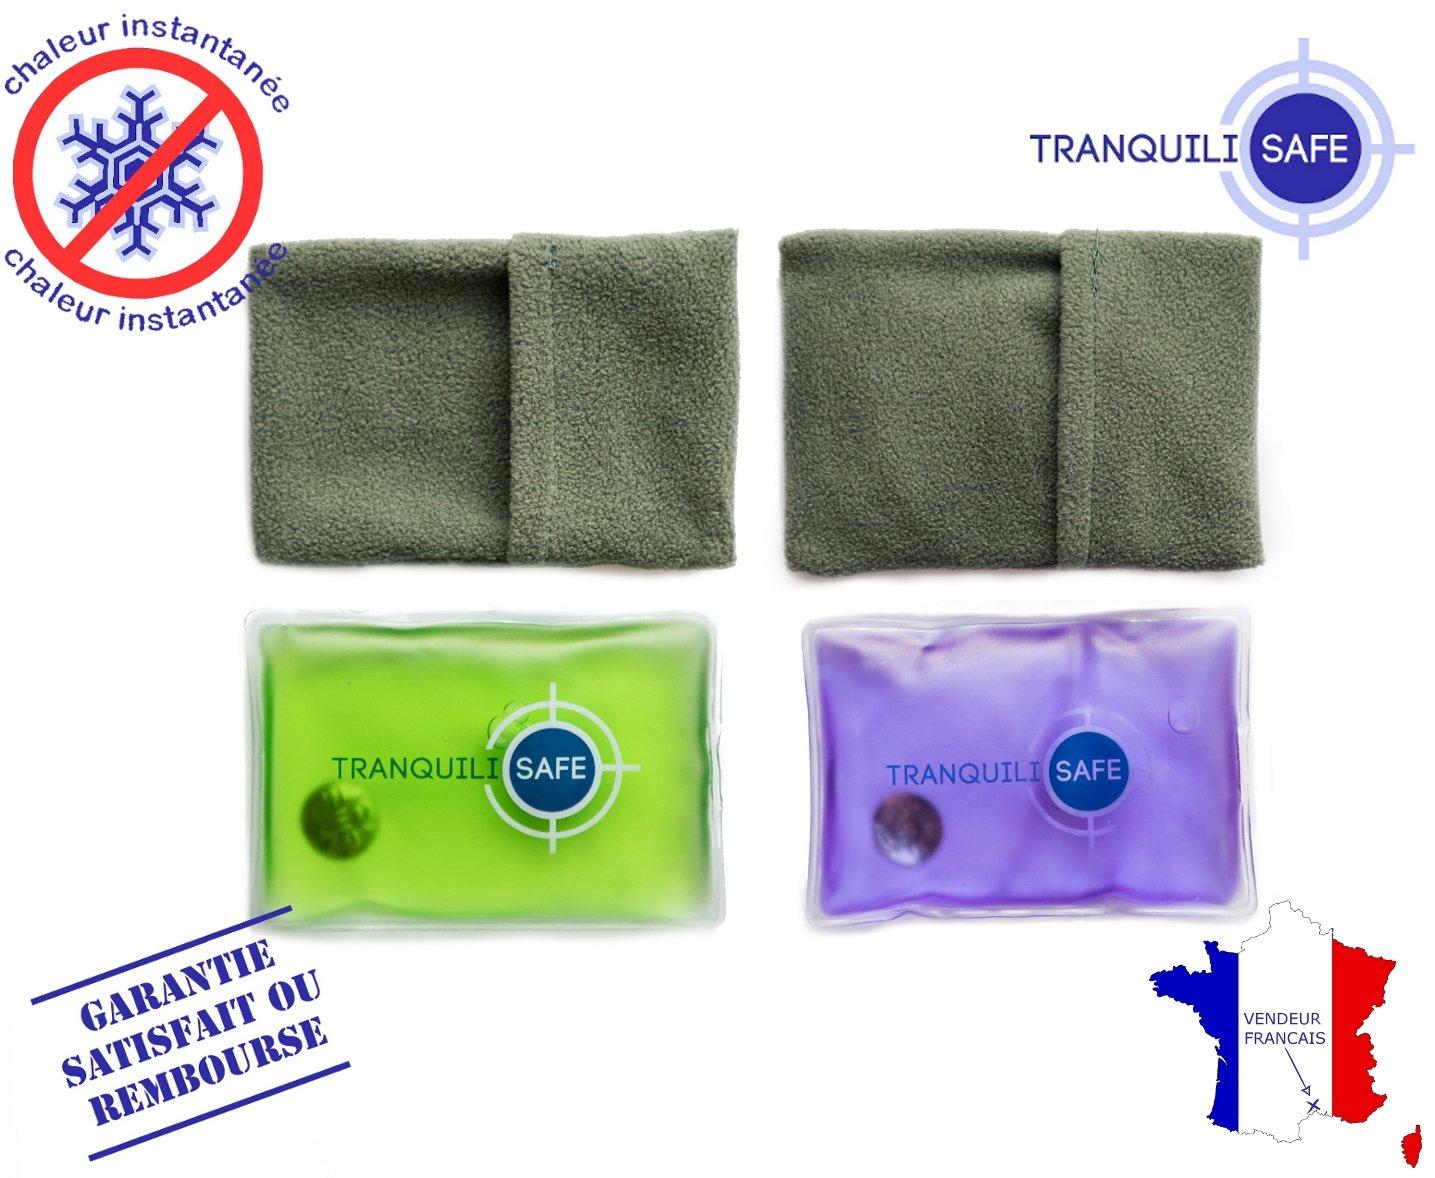 TRANQUILISAFE ® - Set de 2 calentadores de bolsillo- reutilizables y Prácticos - botella de agua caliente mágica 11 * 8 cm - calor Calentador de Manos Gel ...